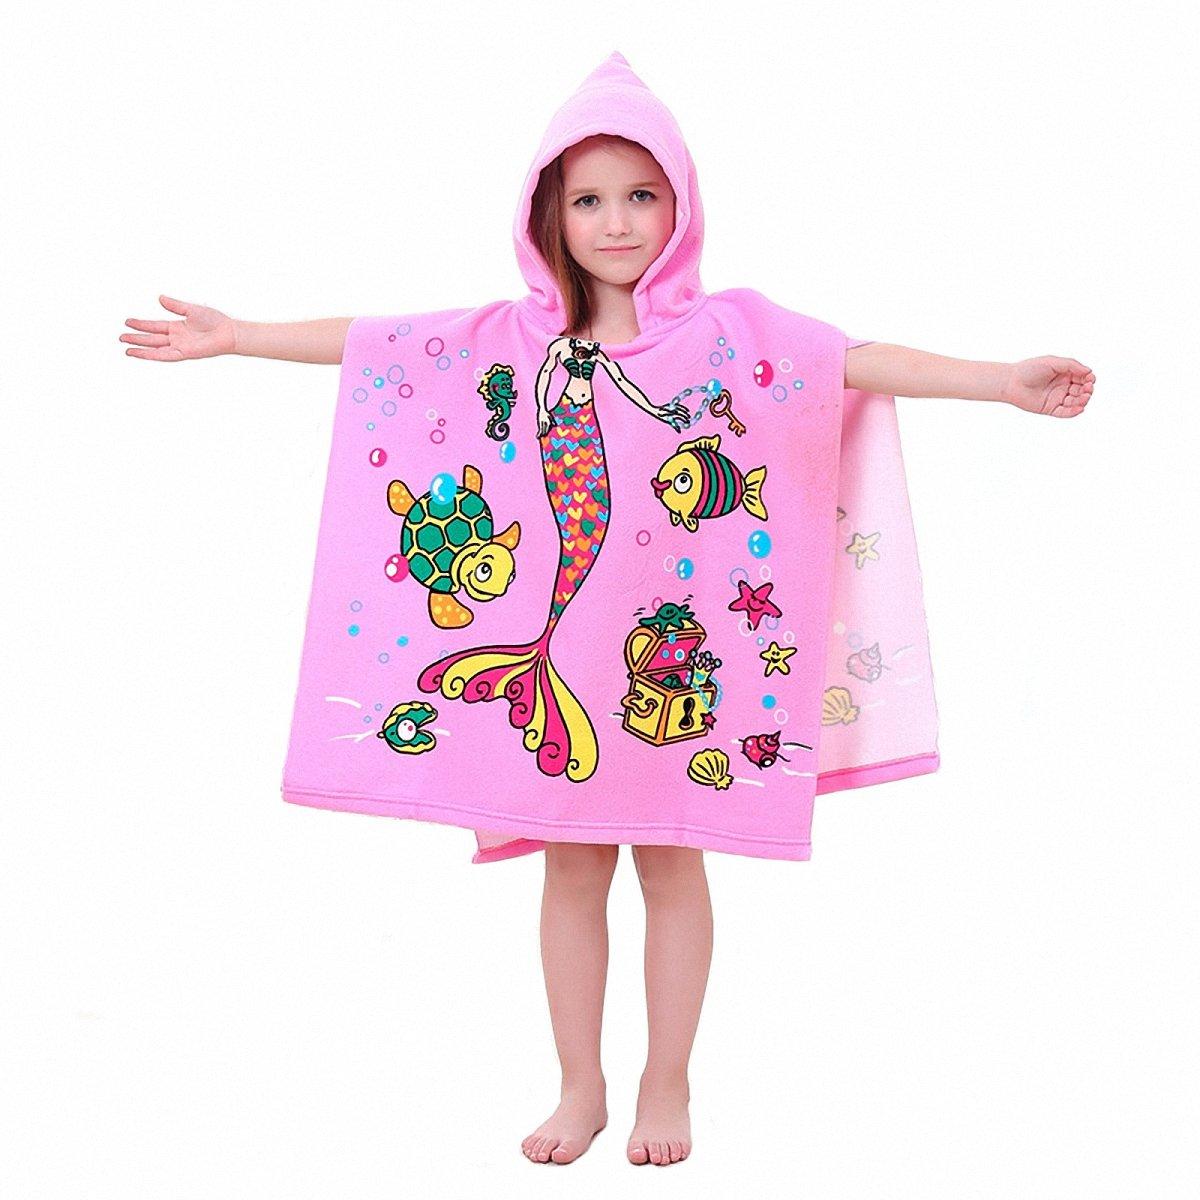 Hooded Towels for Kids Pink Mermaid Bath/Beach Child Towels